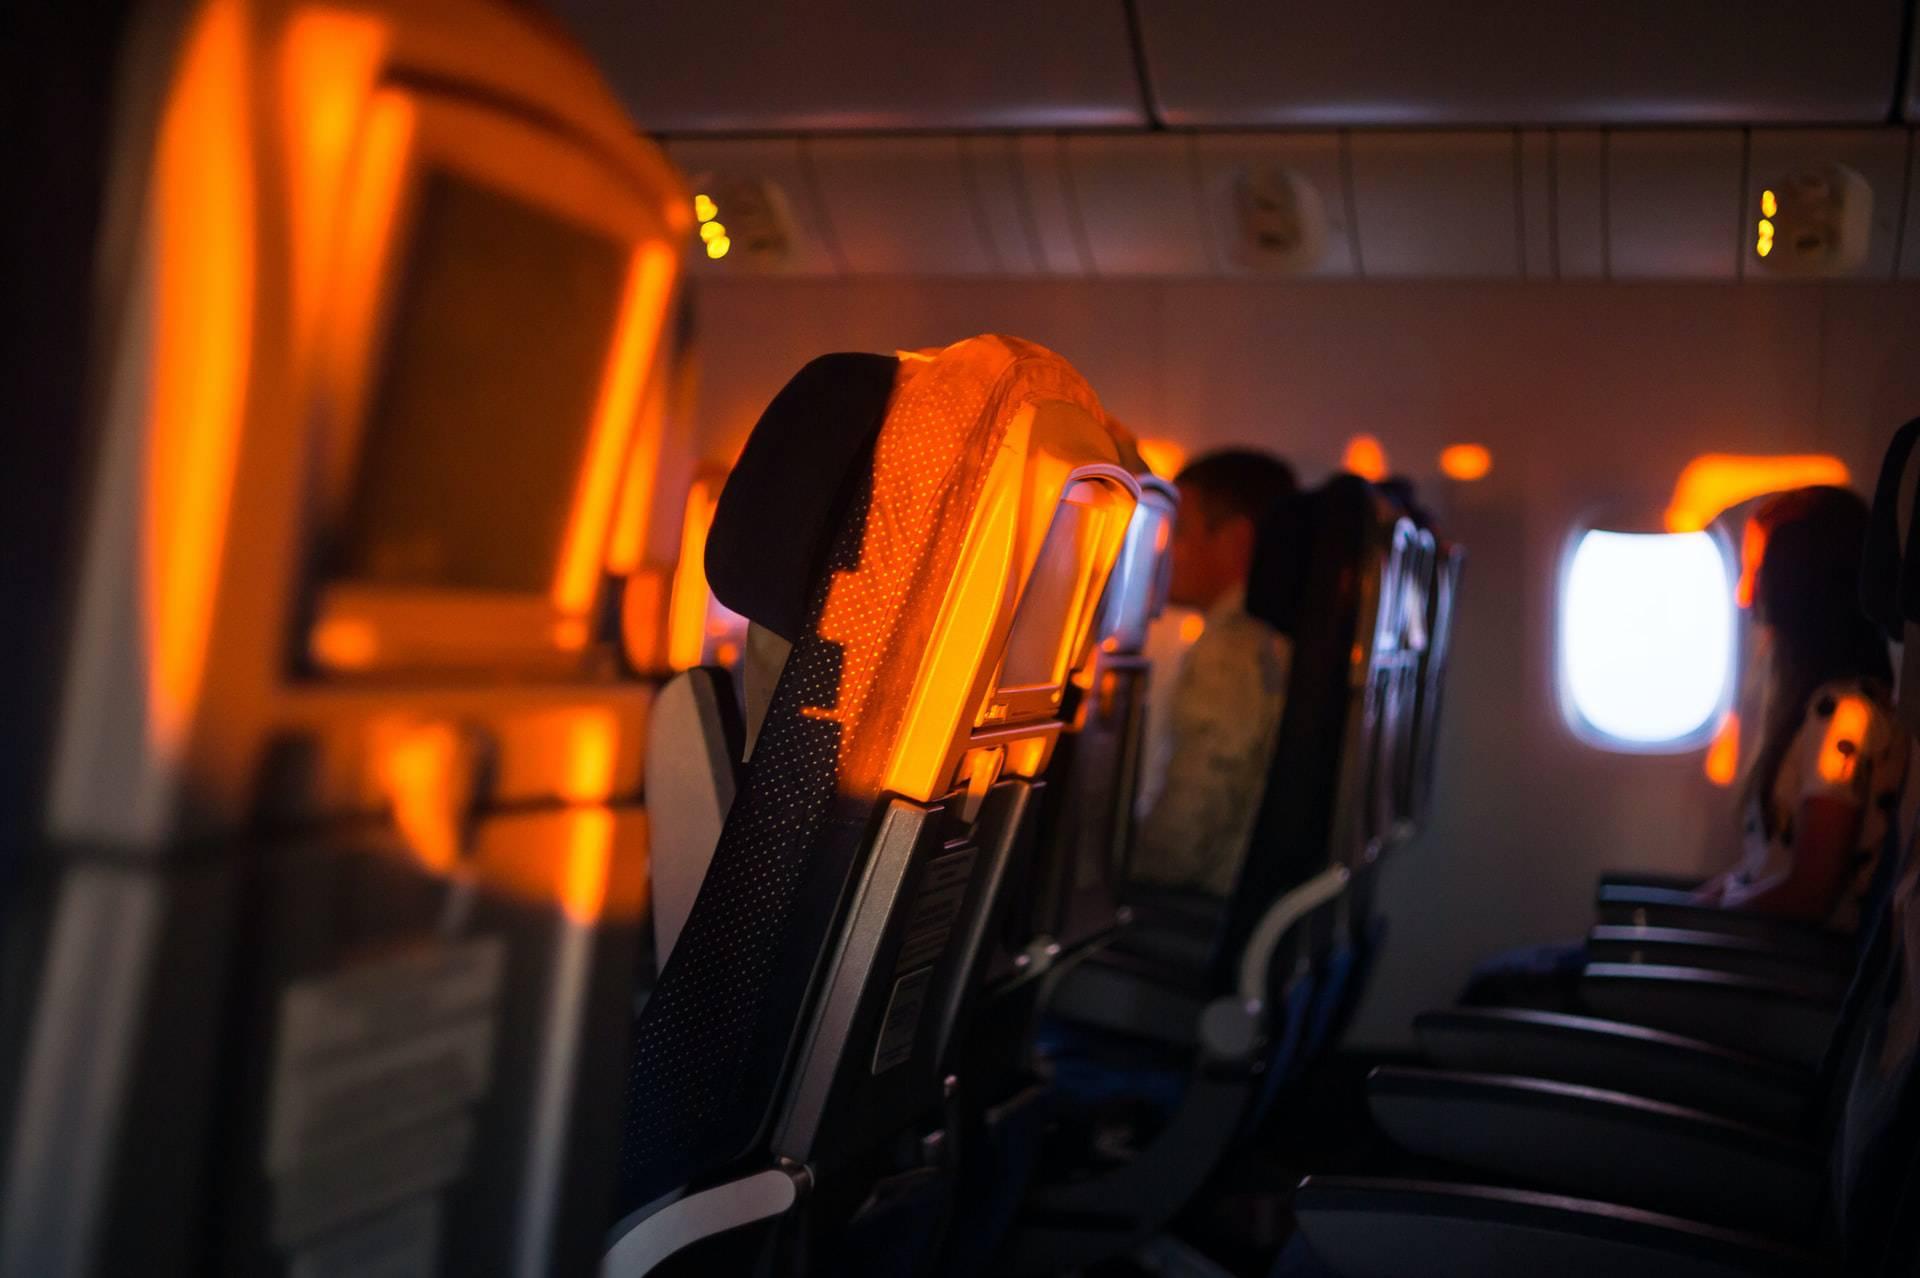 Long flight essentials